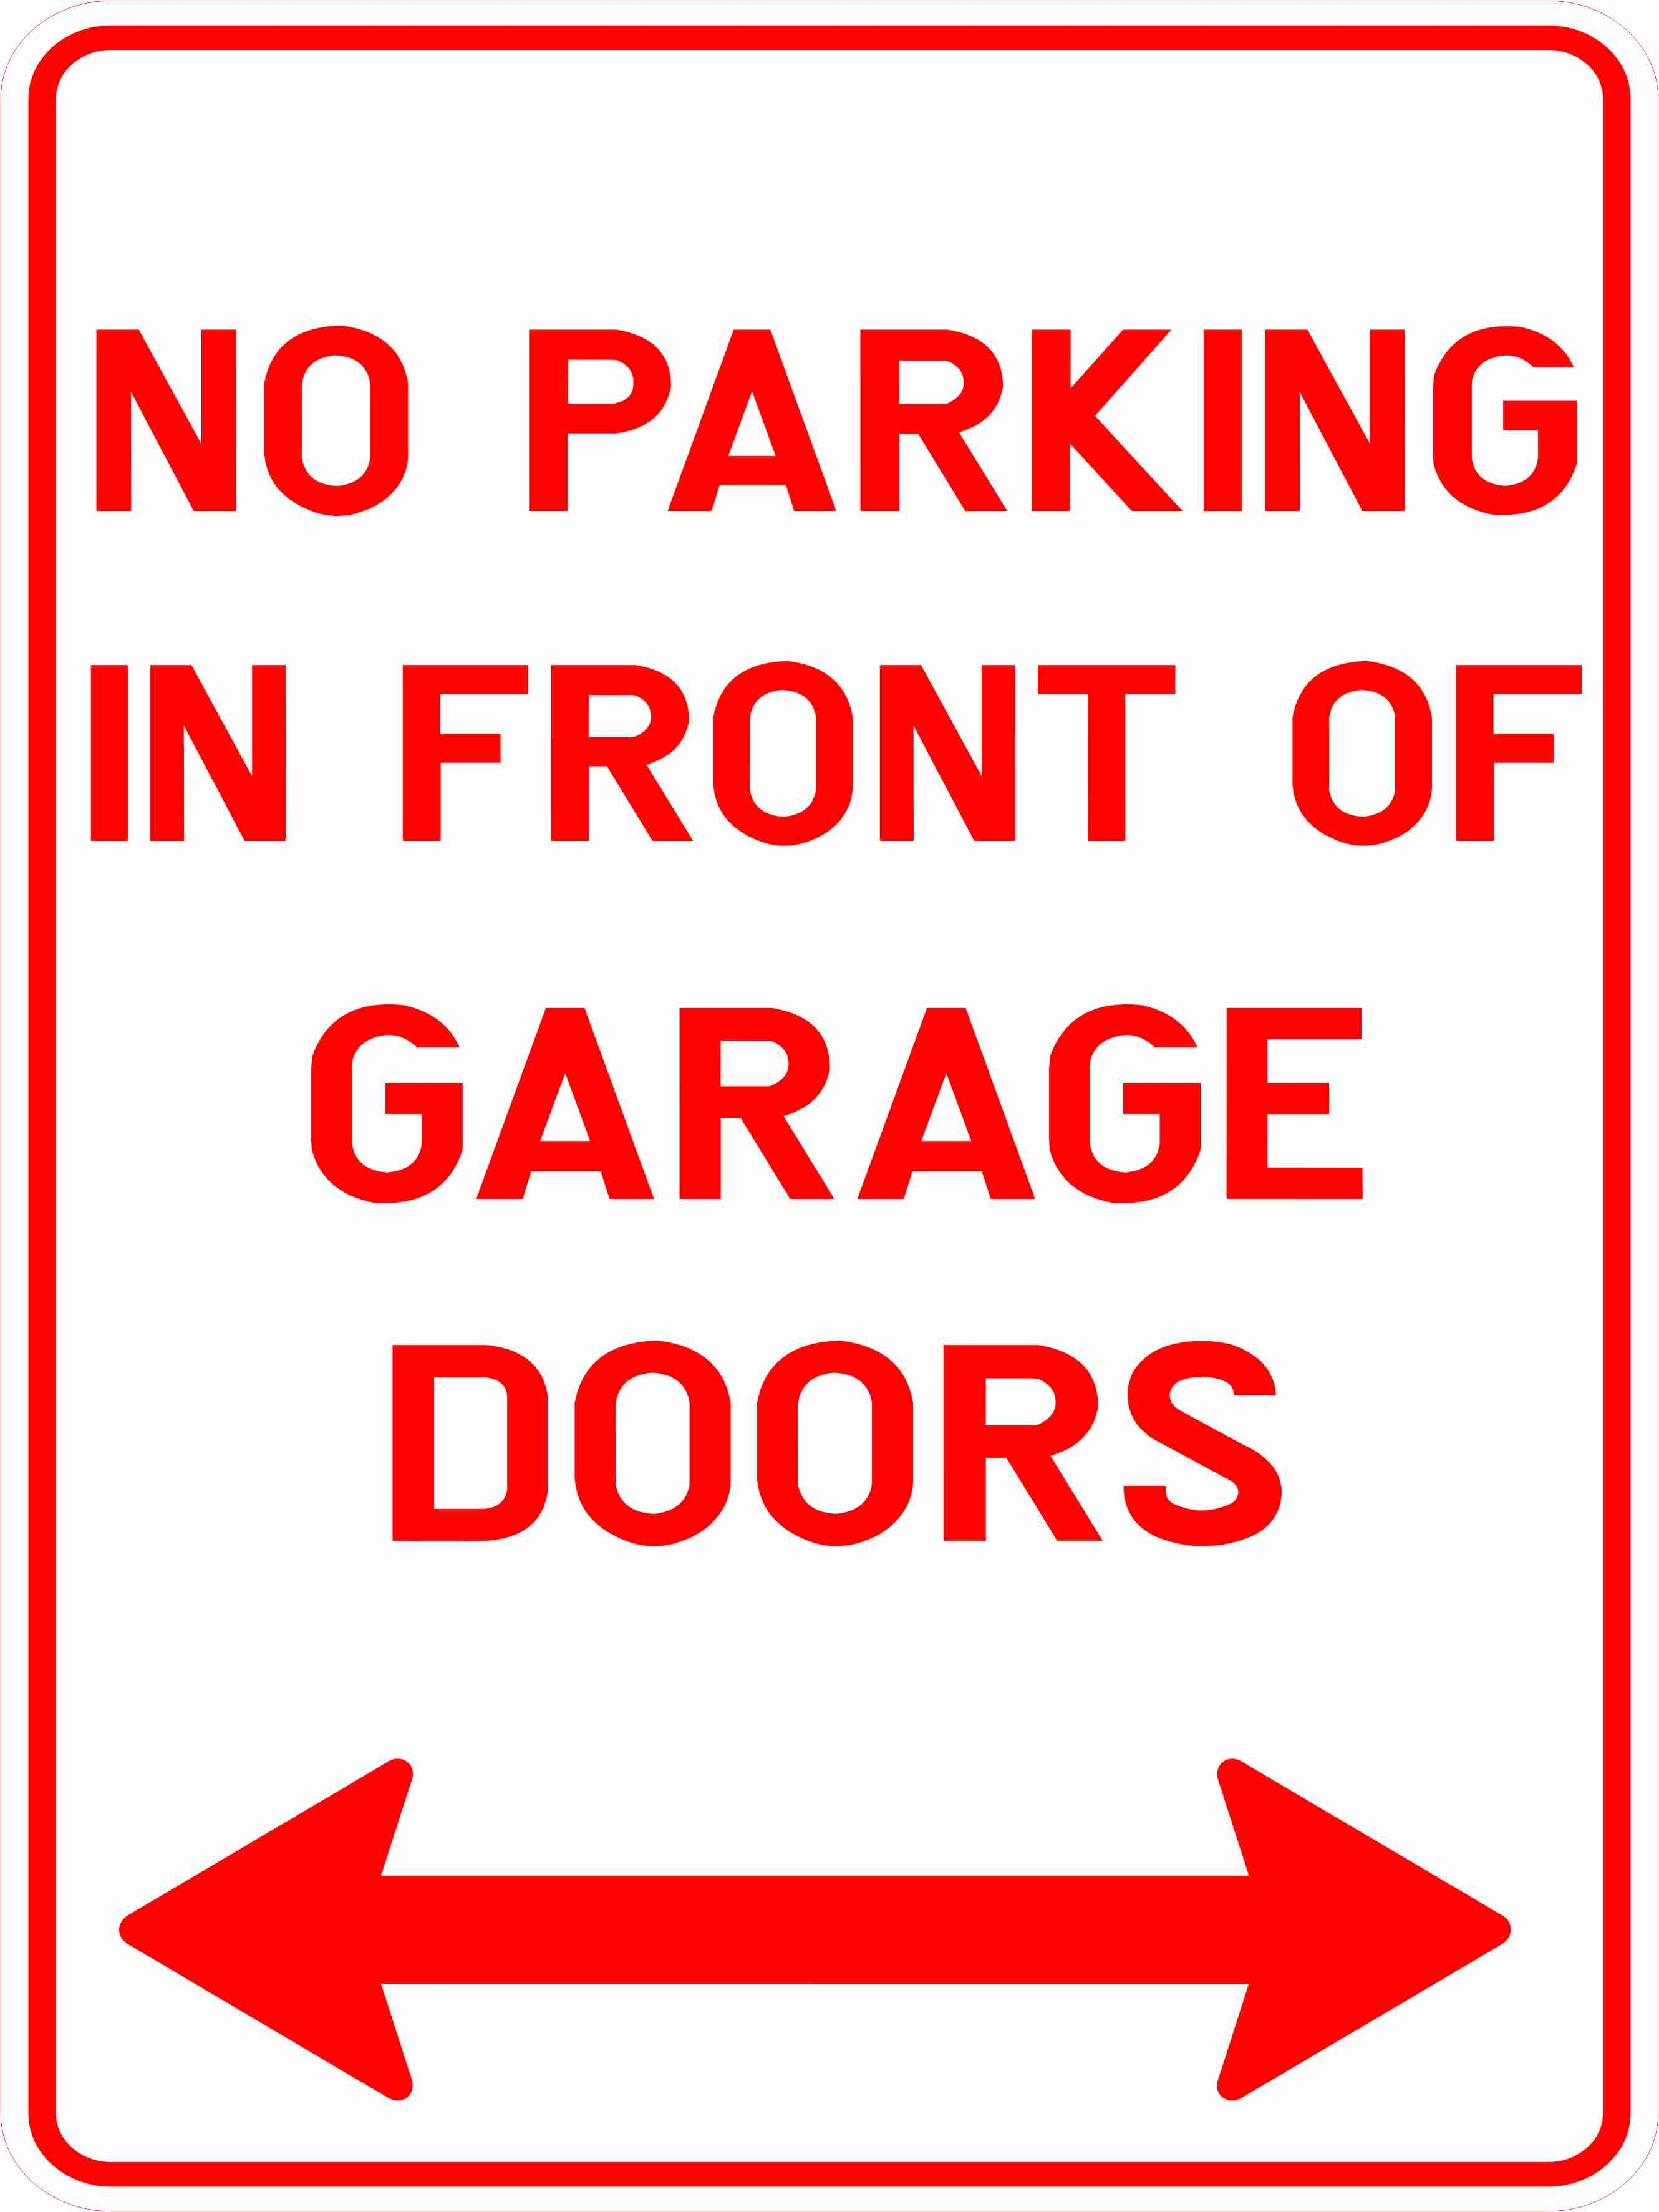 No parking in front of garage doors discount safety for Garage door repair round lake il